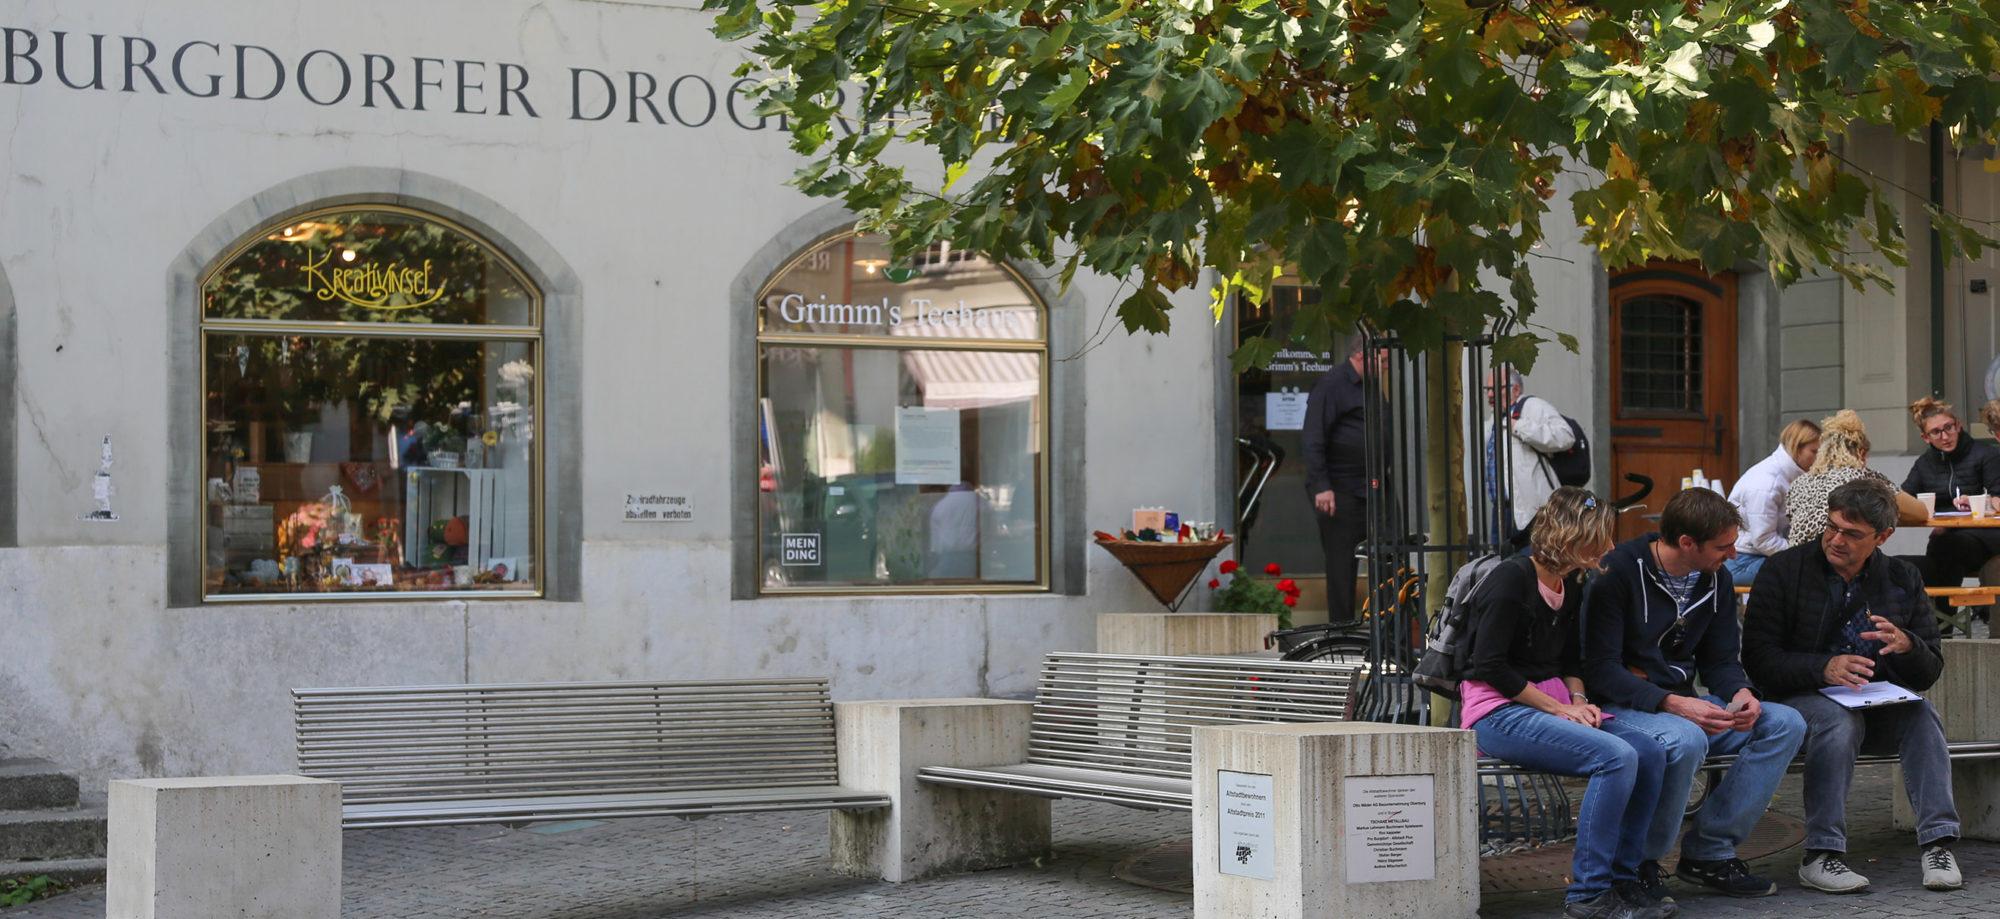 Das Burgdorfer Biografische Institut